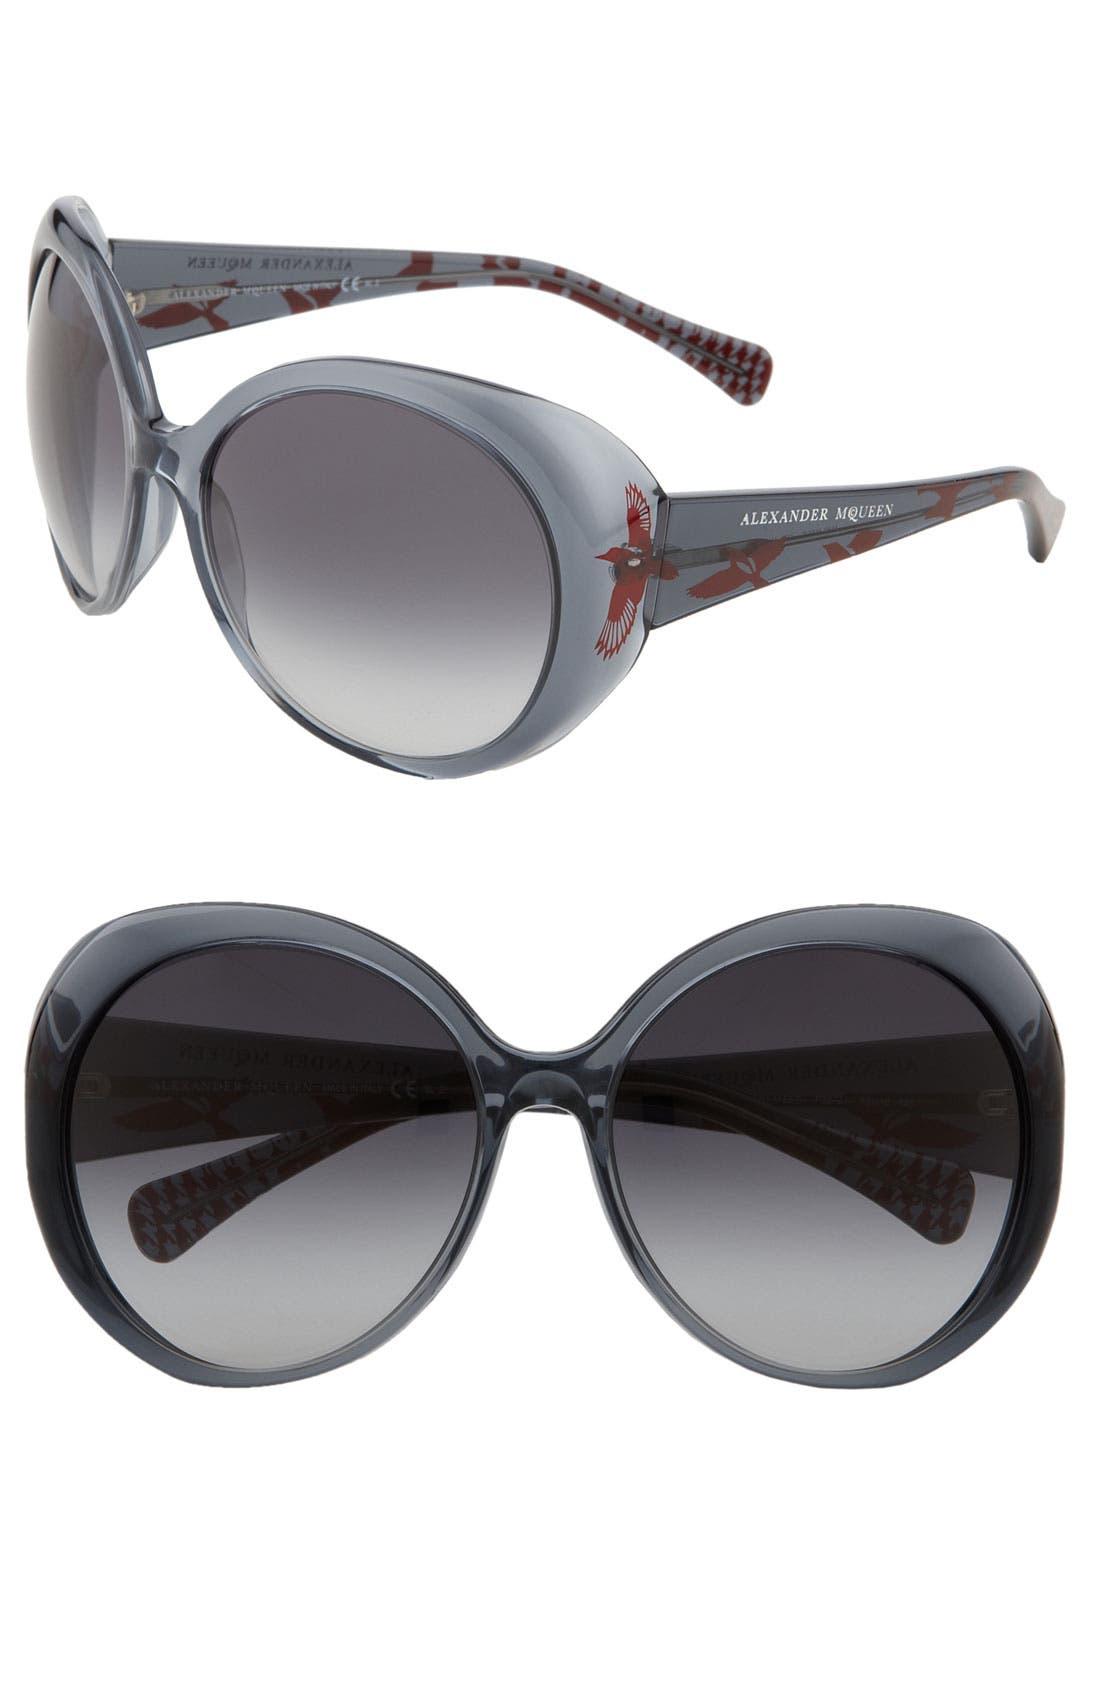 Main Image - Alexander McQueen 'Bird Design' Oversized Round Sunglasses